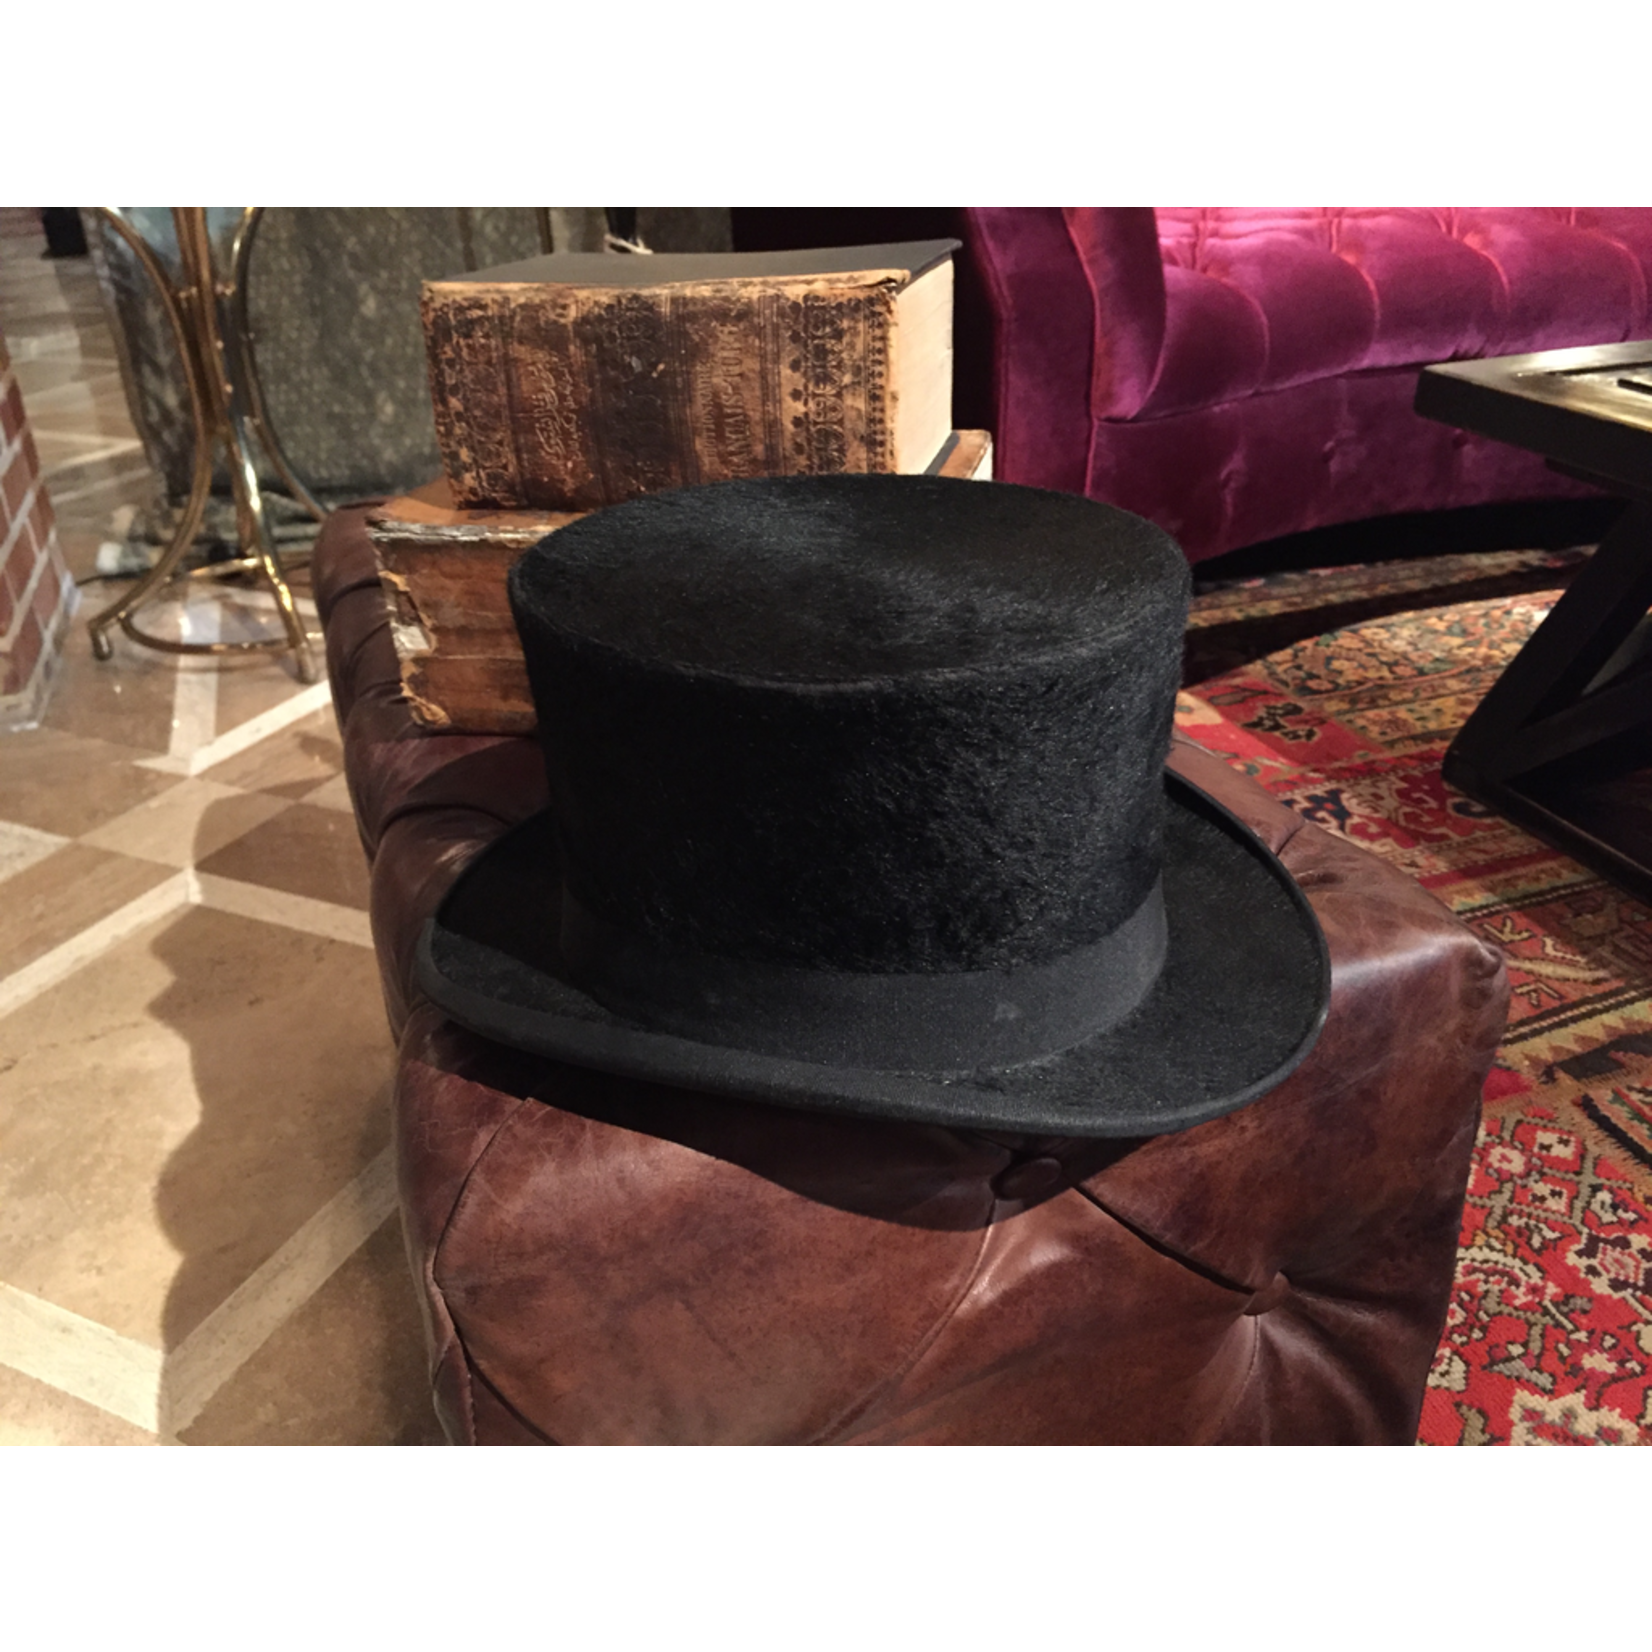 TAJHOME Top Hat- Christys' London